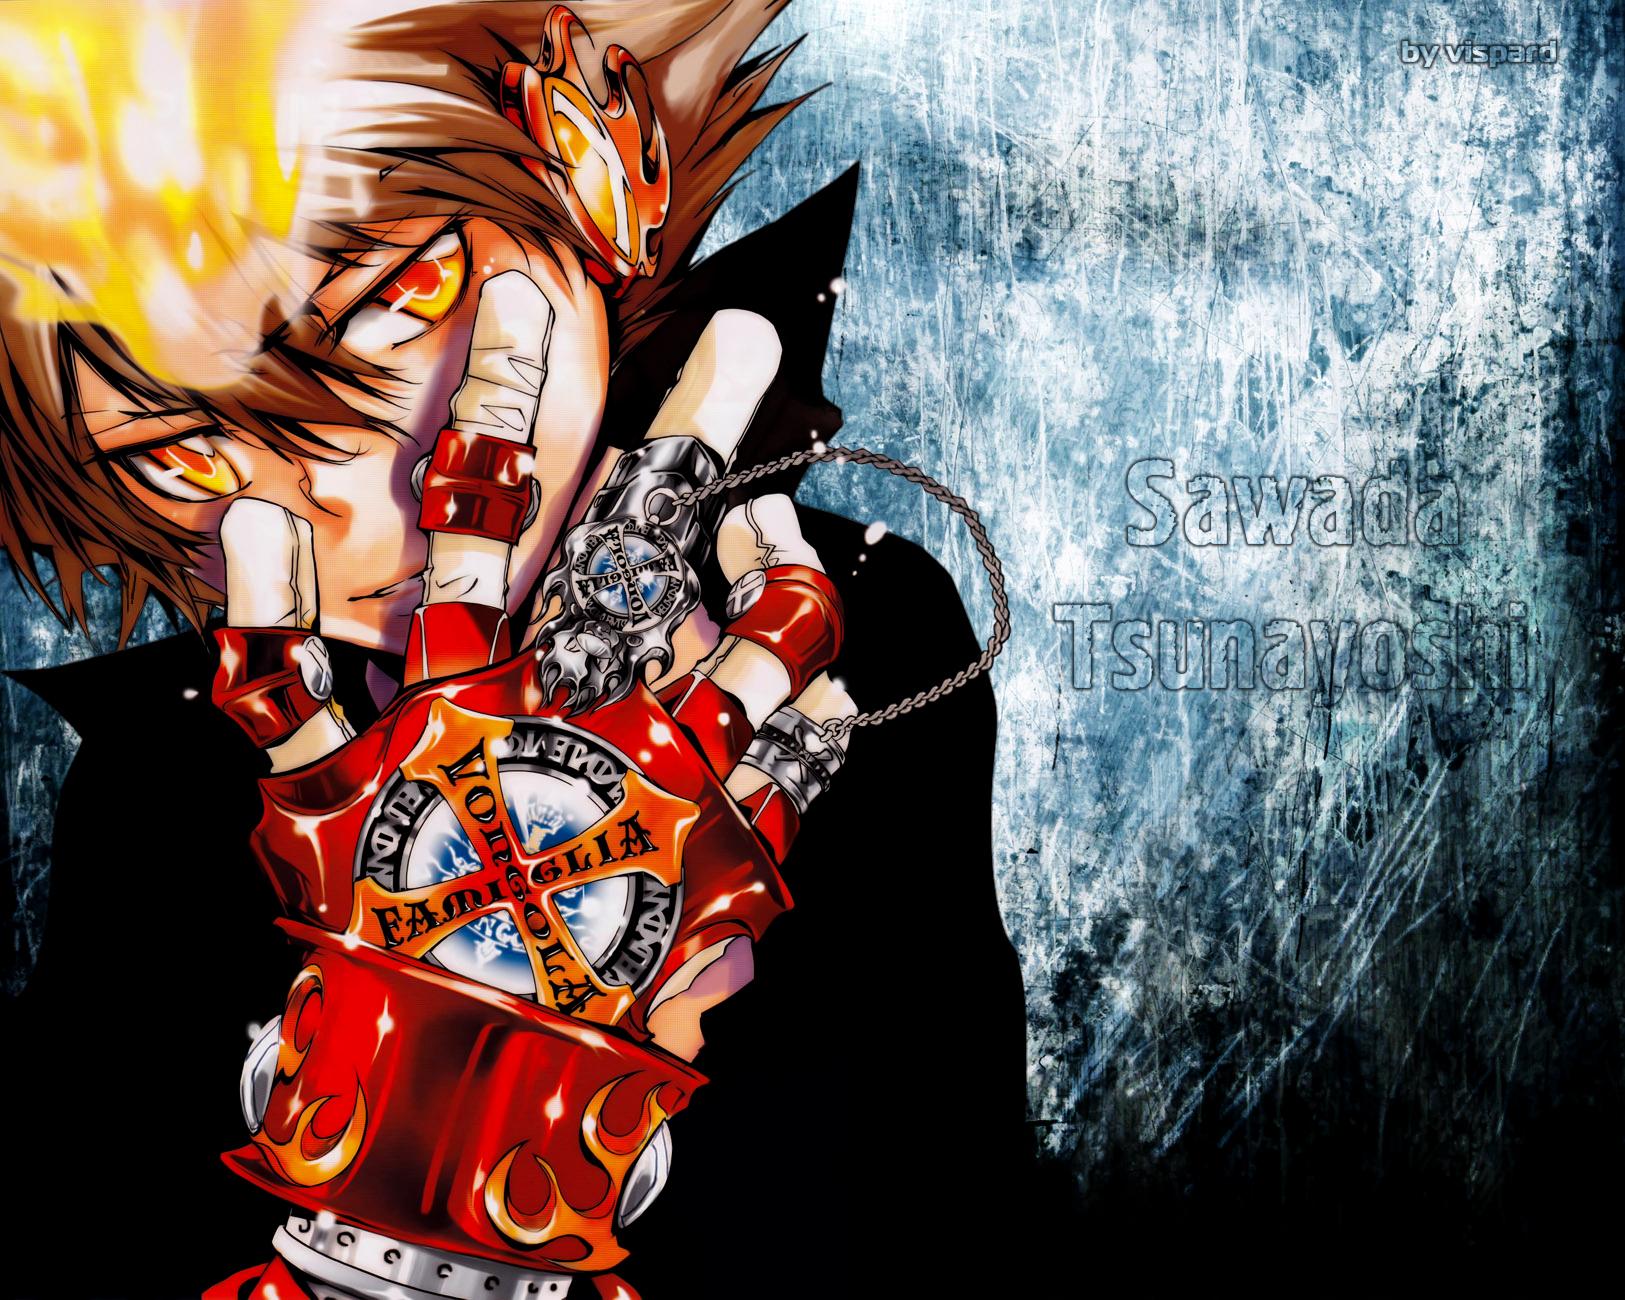 katekyo hitman reborn sawada tsunayoshi HD Wallpaper of Anime Manga 1625x1300